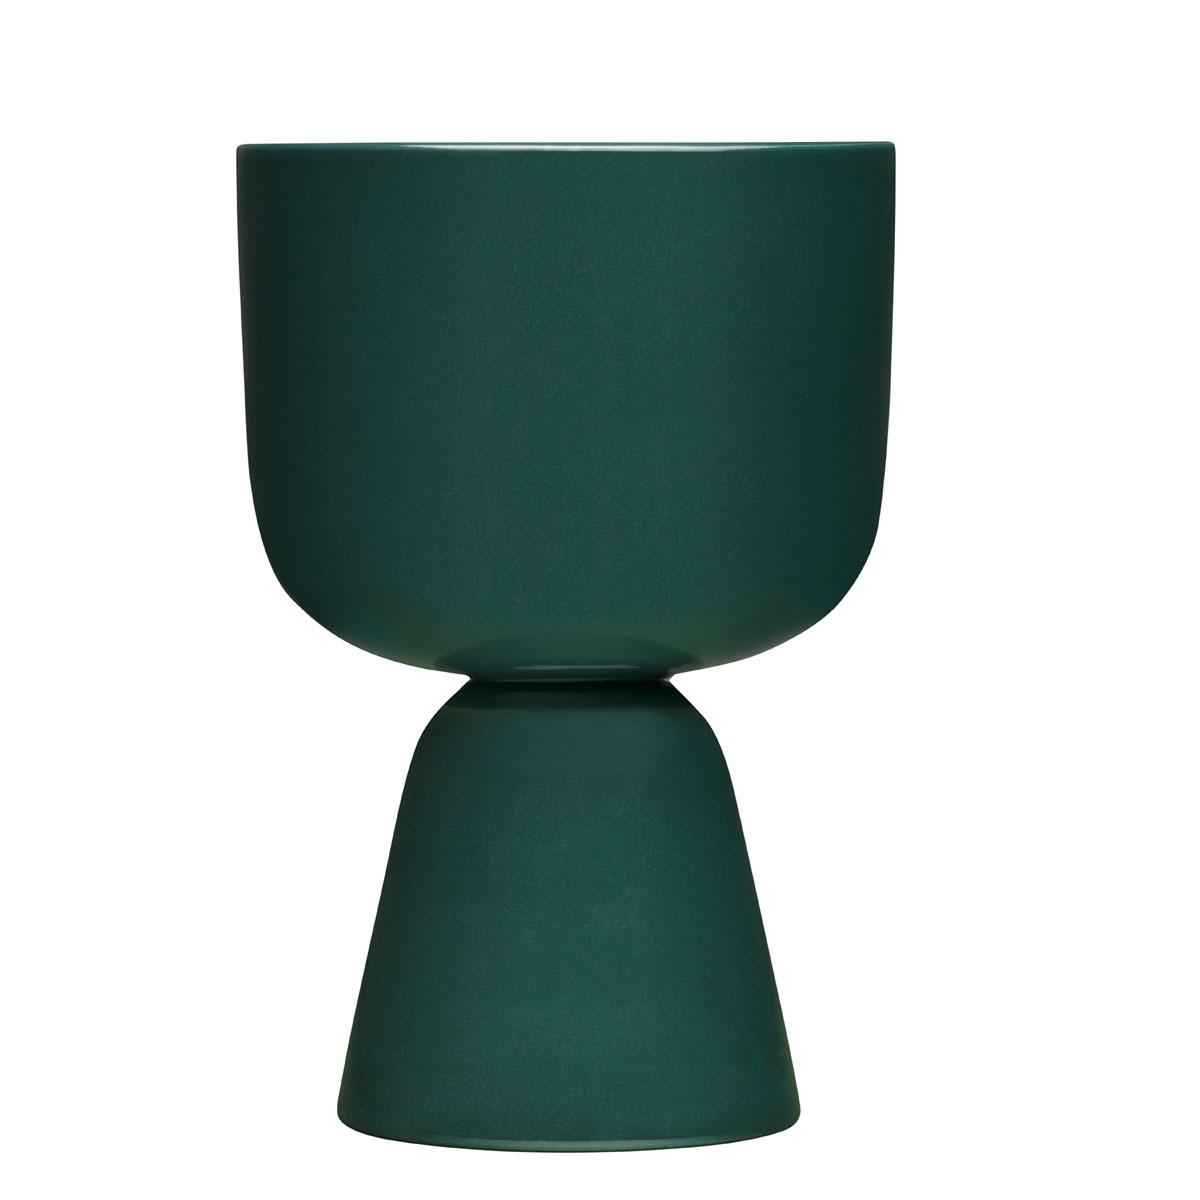 "Iittala Nappula Plant Pot 9x6"" Dark Green"